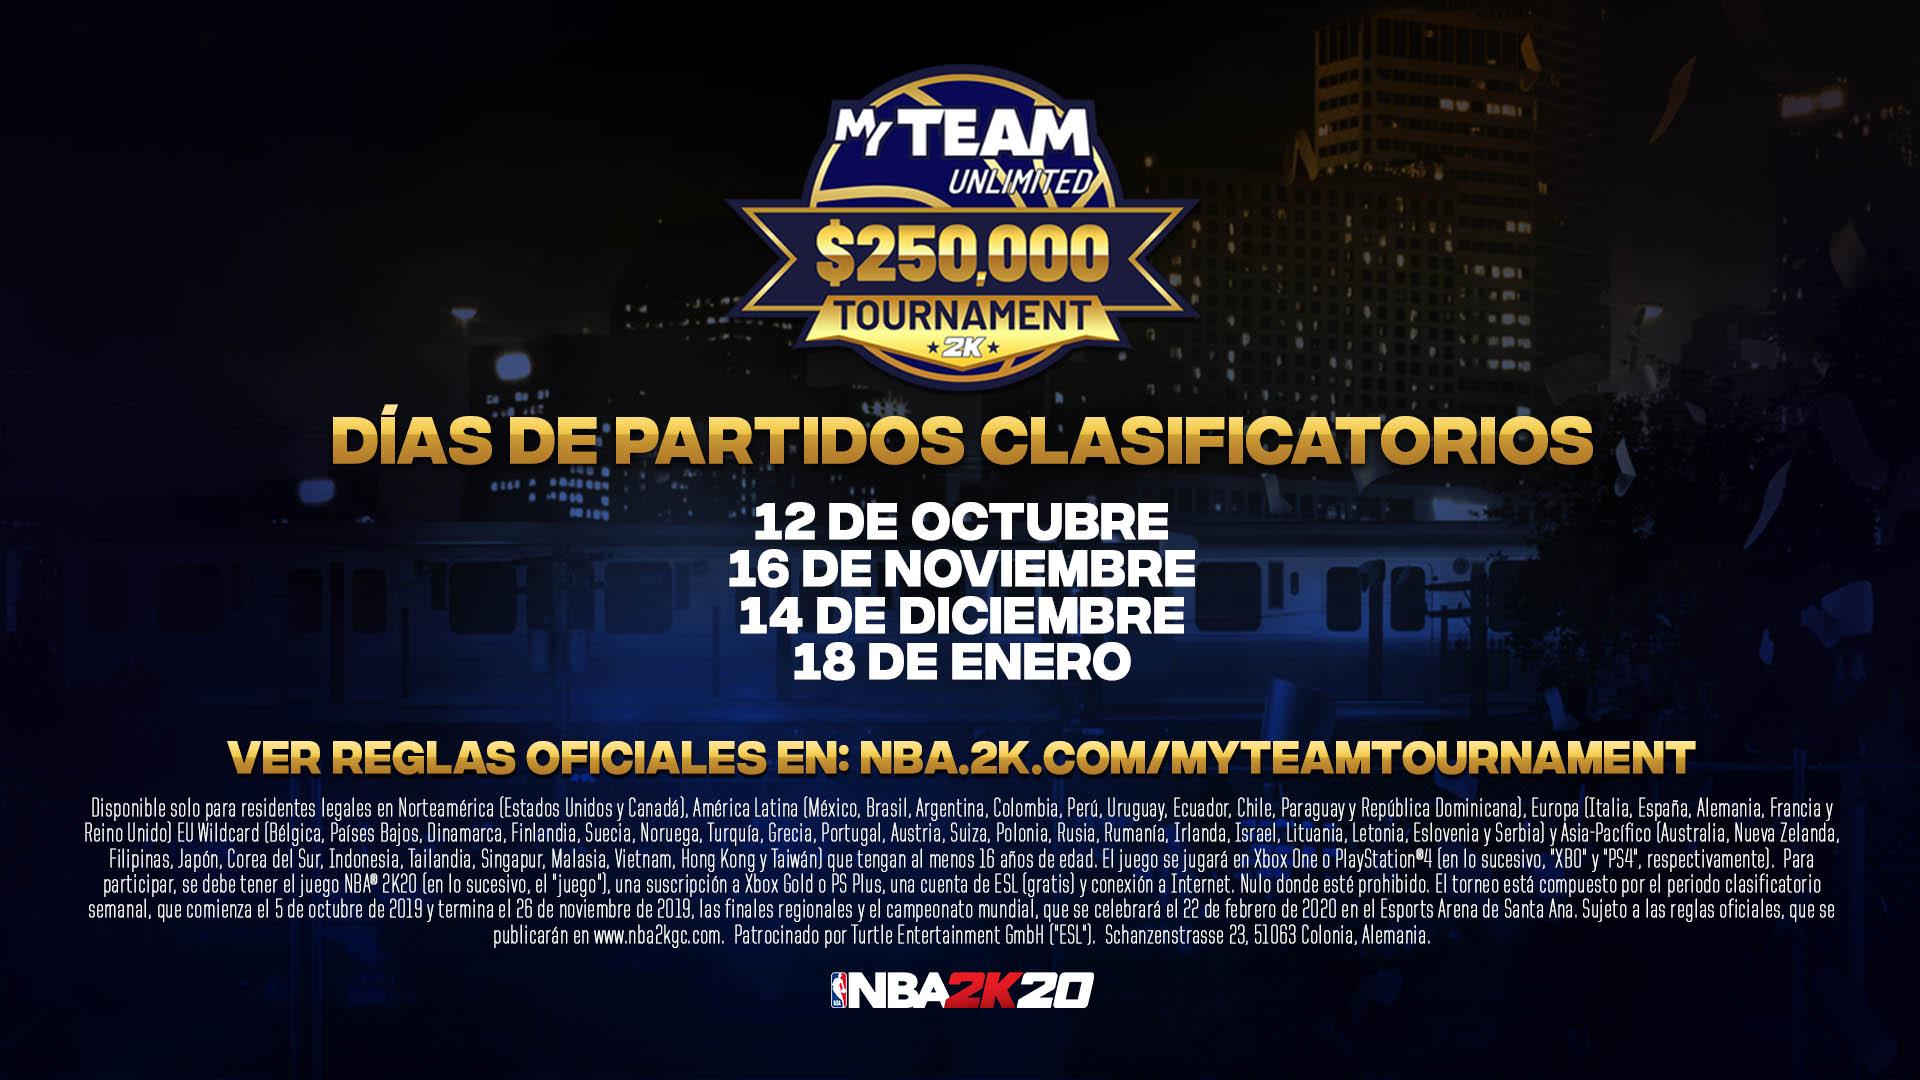 torneo NBA 2K20